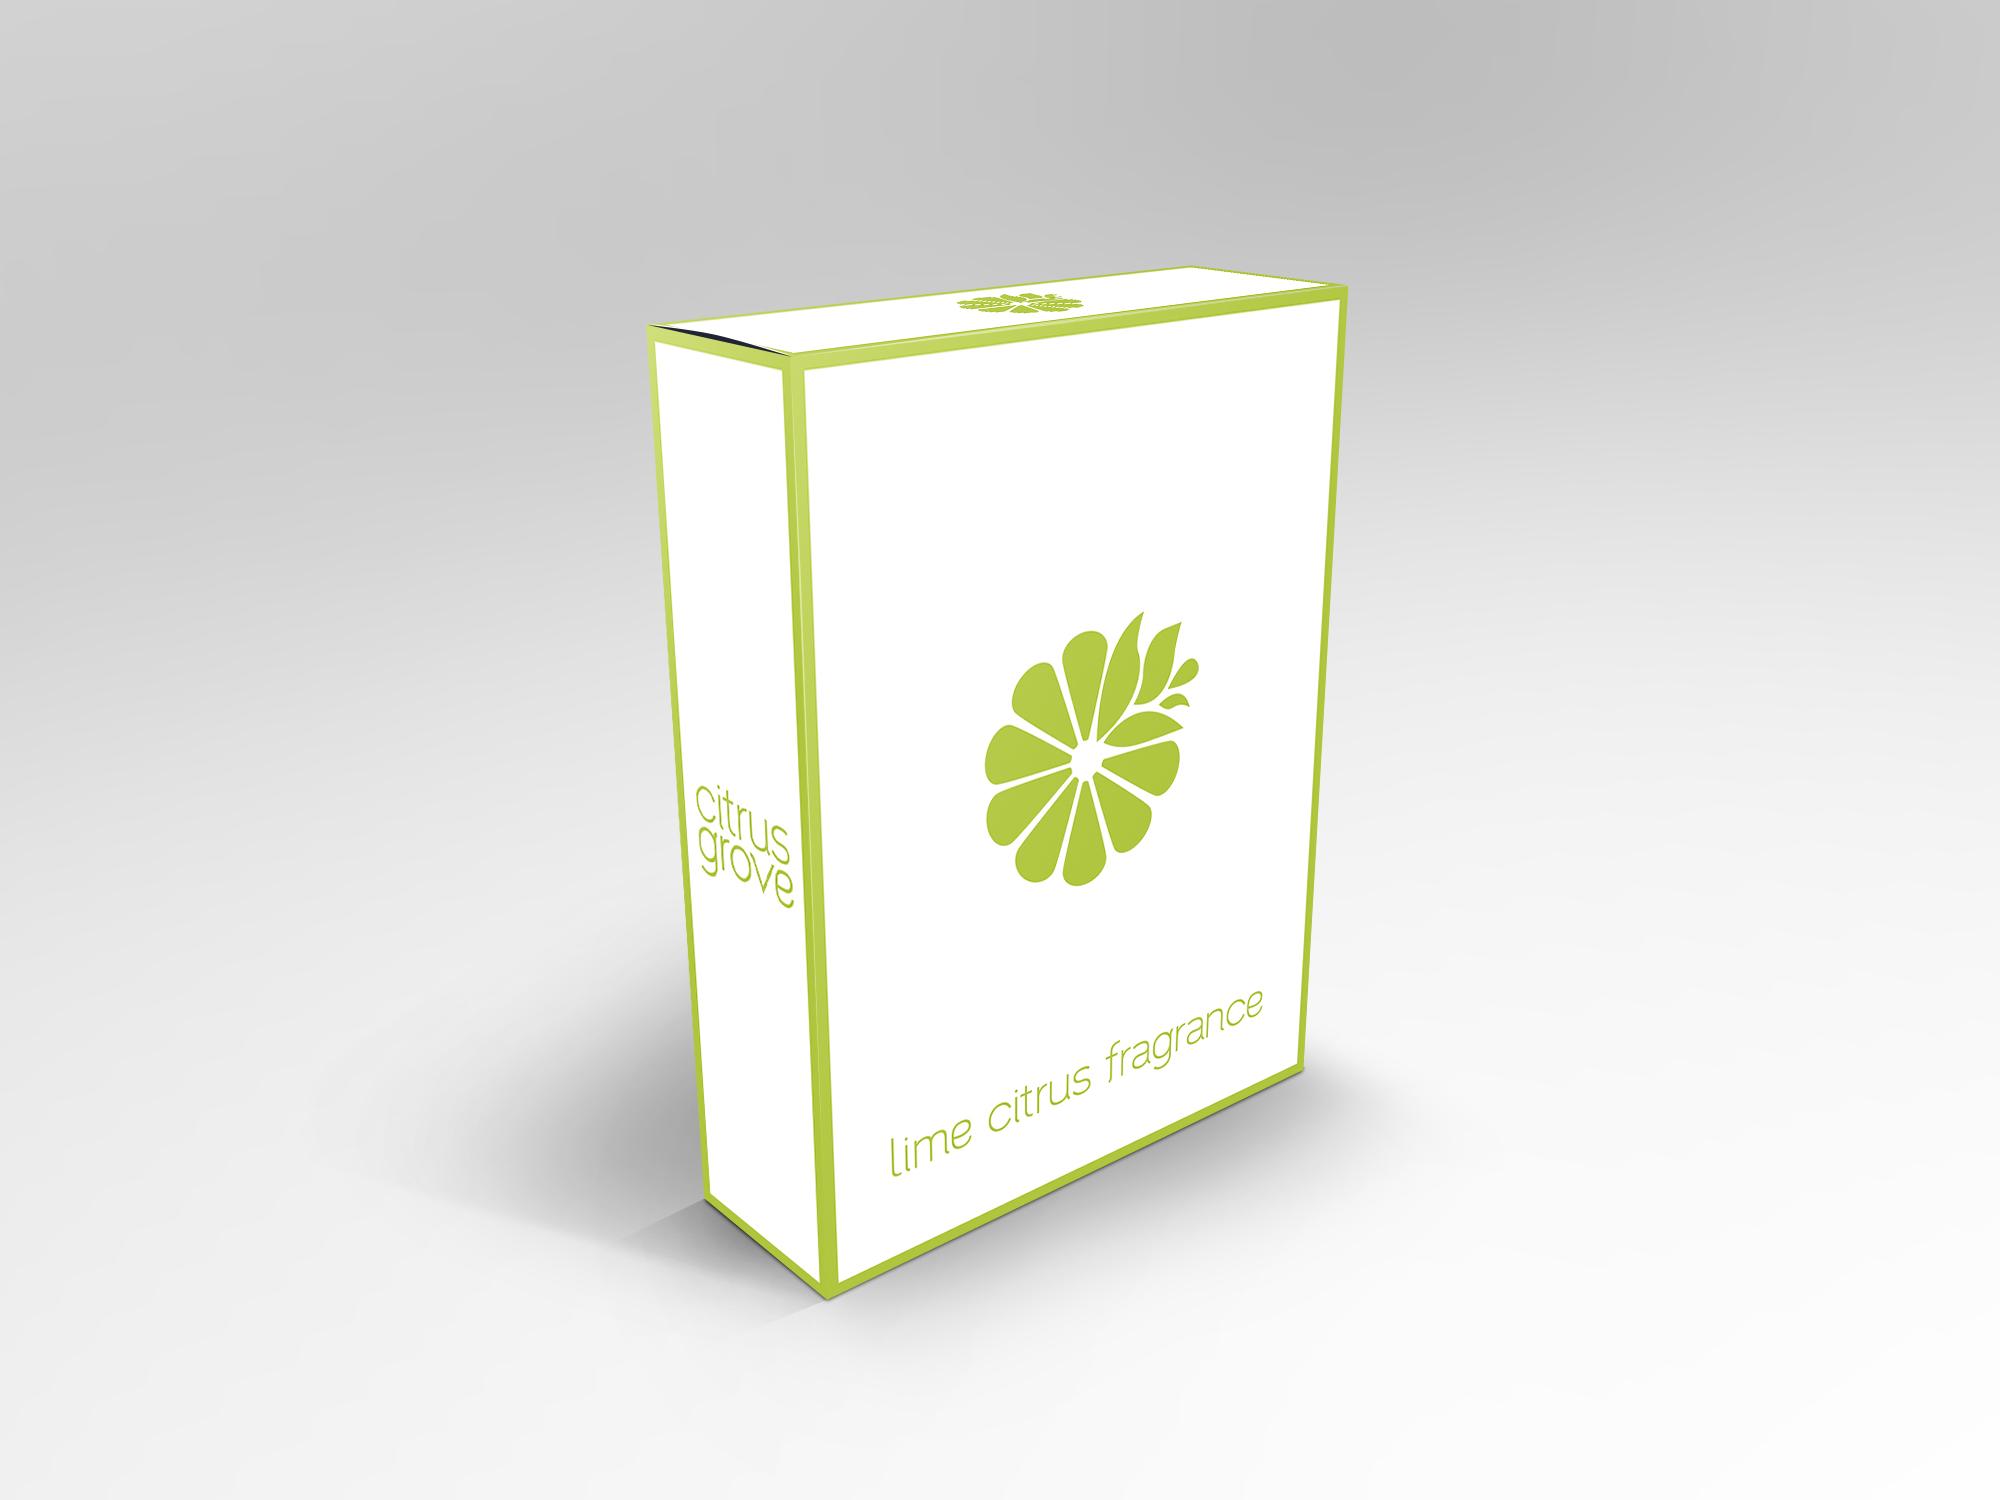 lime citrus box.jpg